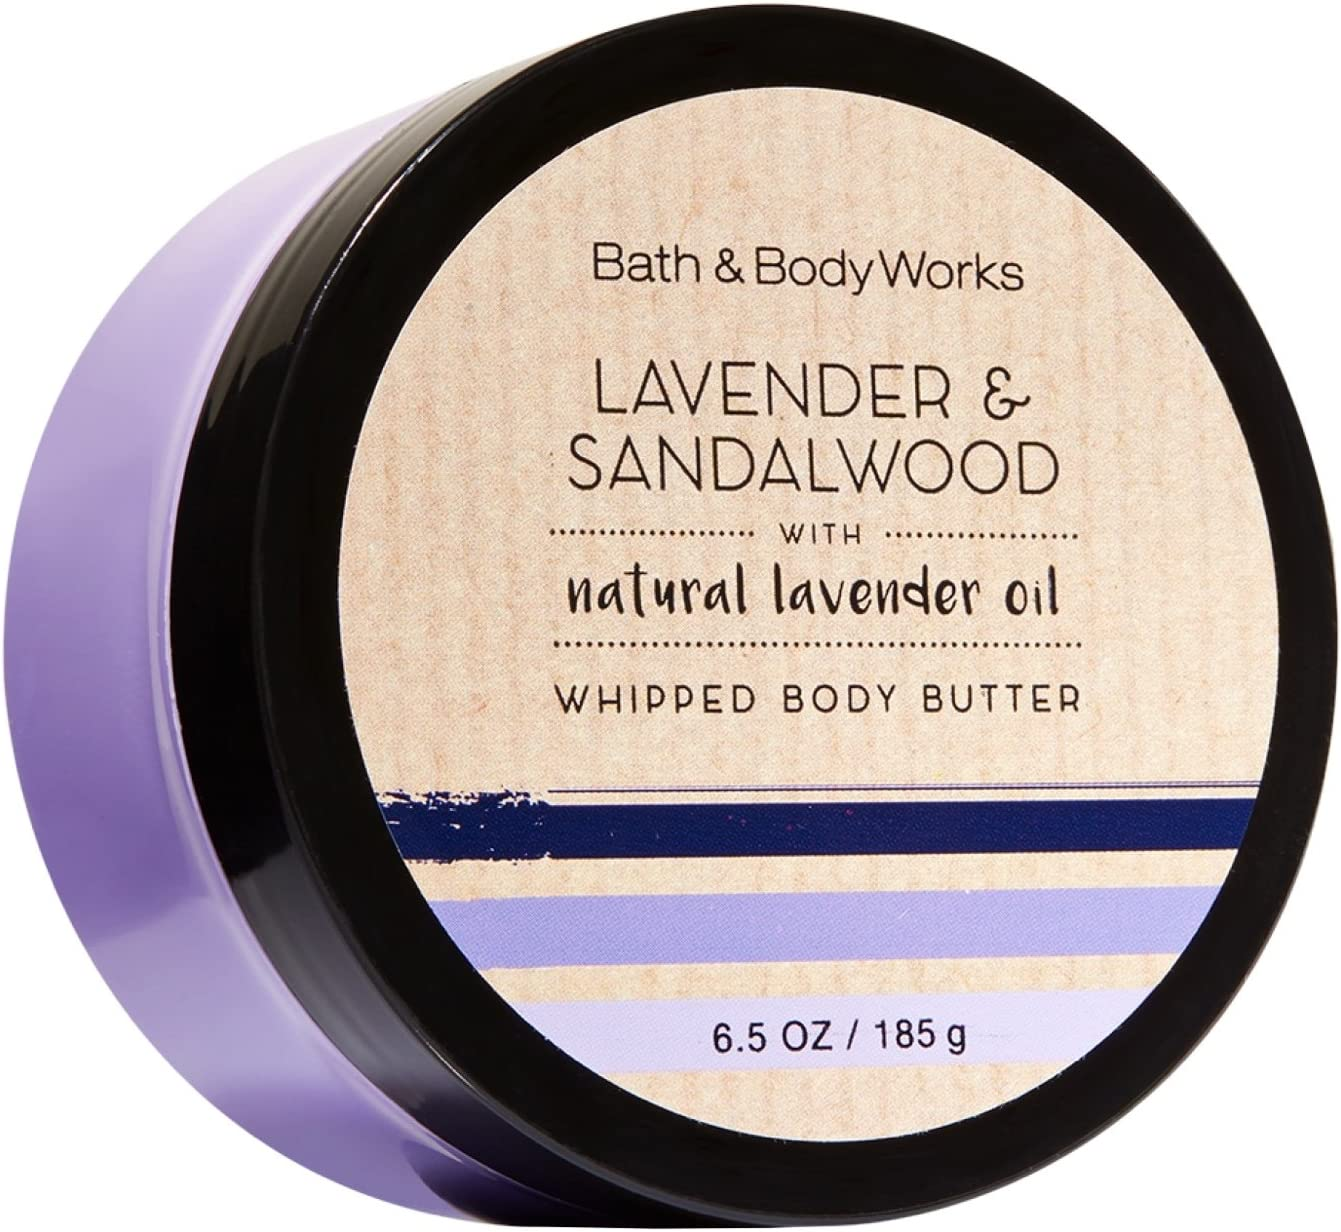 Bath & Body Works 6.5 Ounce Whipped Body Butter Lavender & Sandalwood